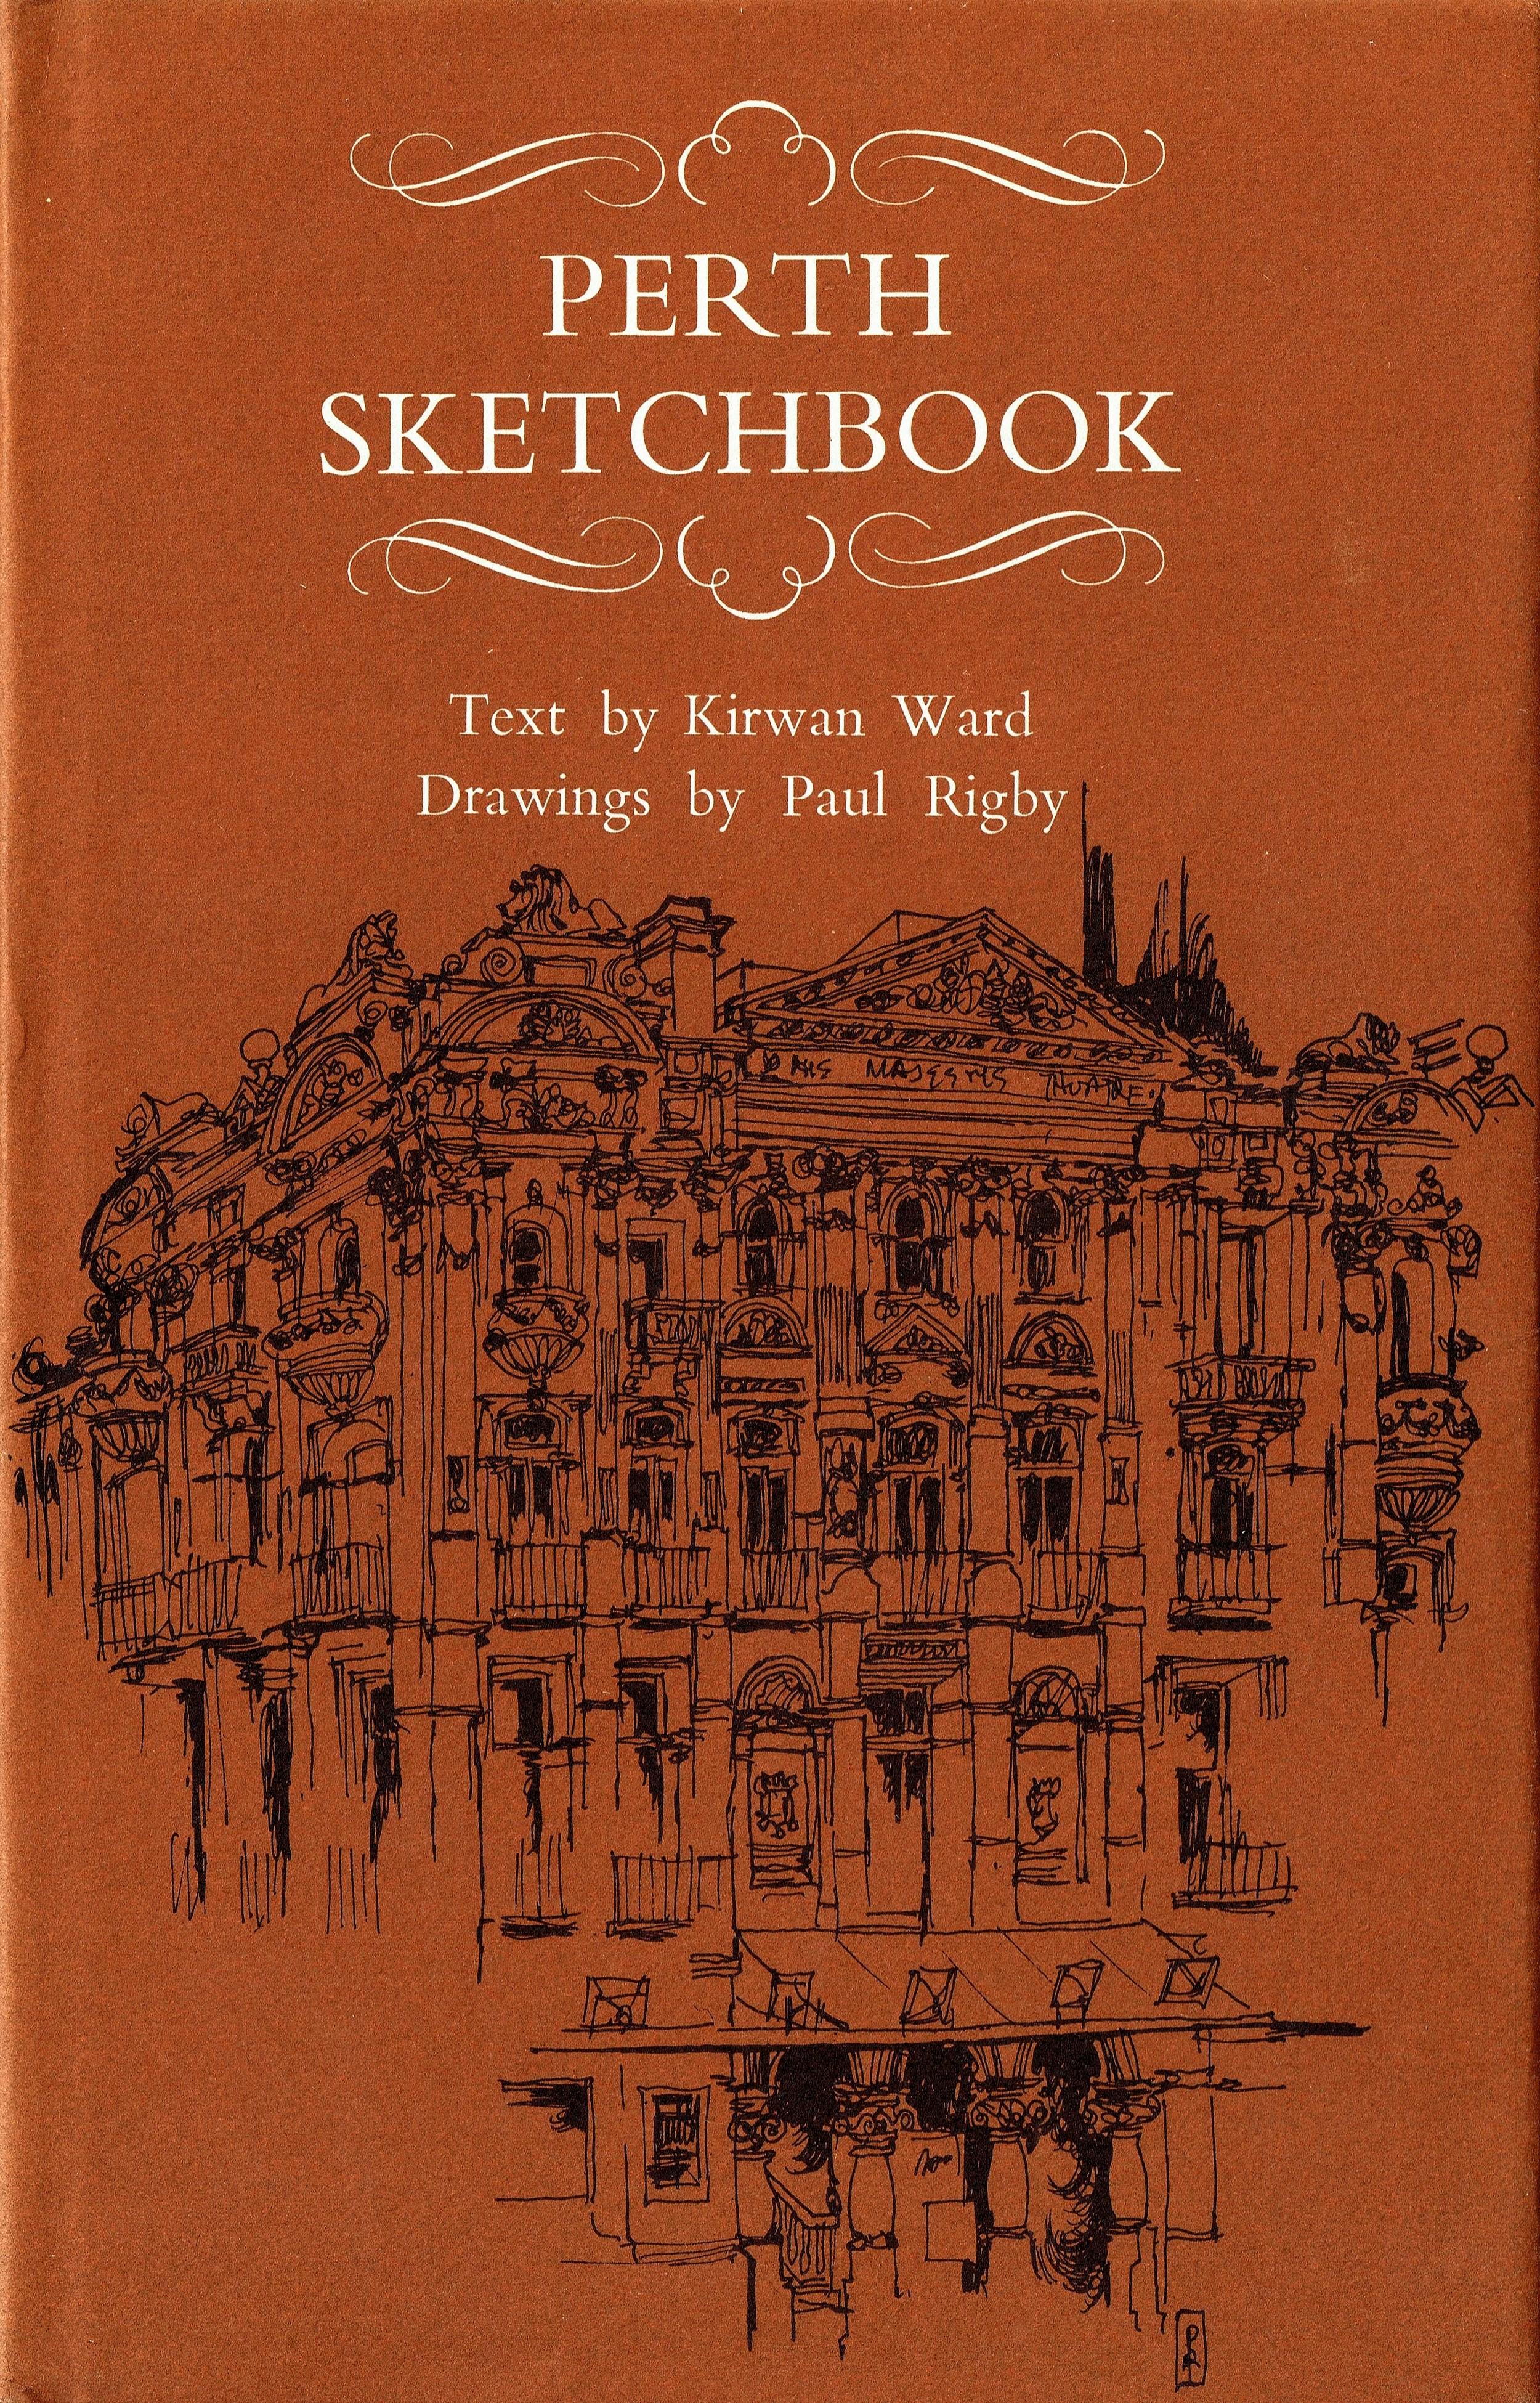 Perth-Sketchbook